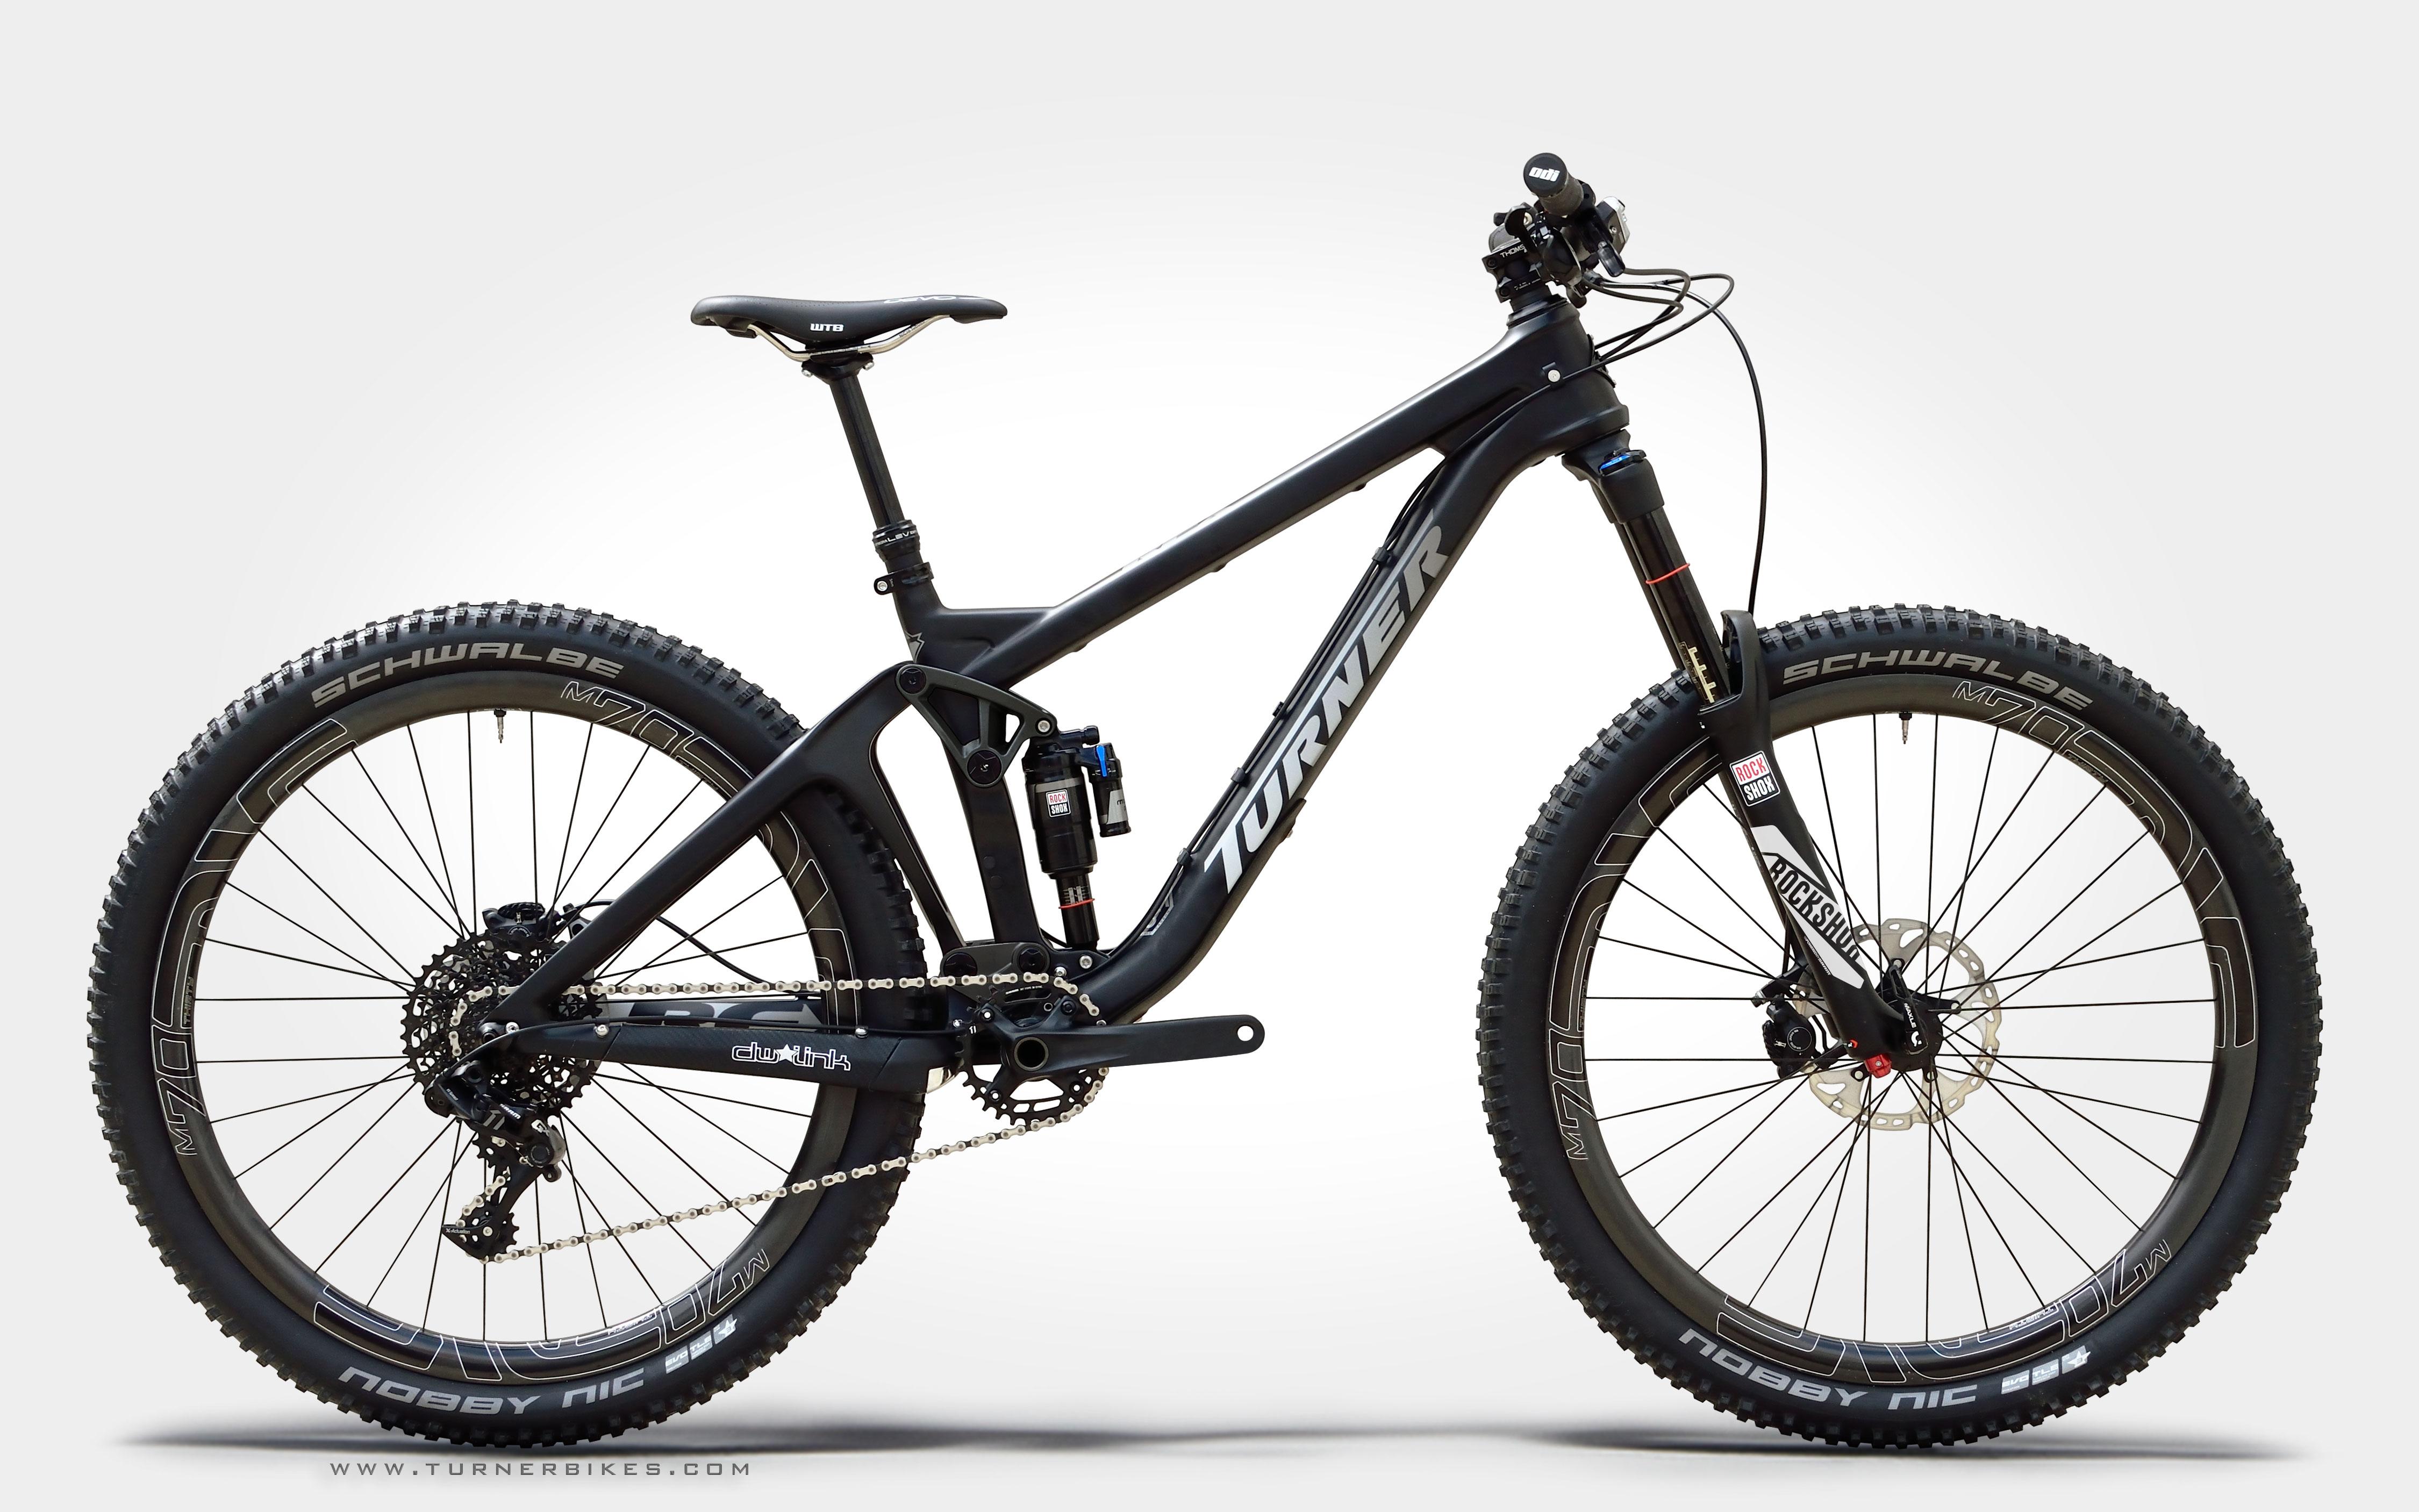 RFX 4.0 | 27.5 Enduro Mountain Bike | Turner Bikes